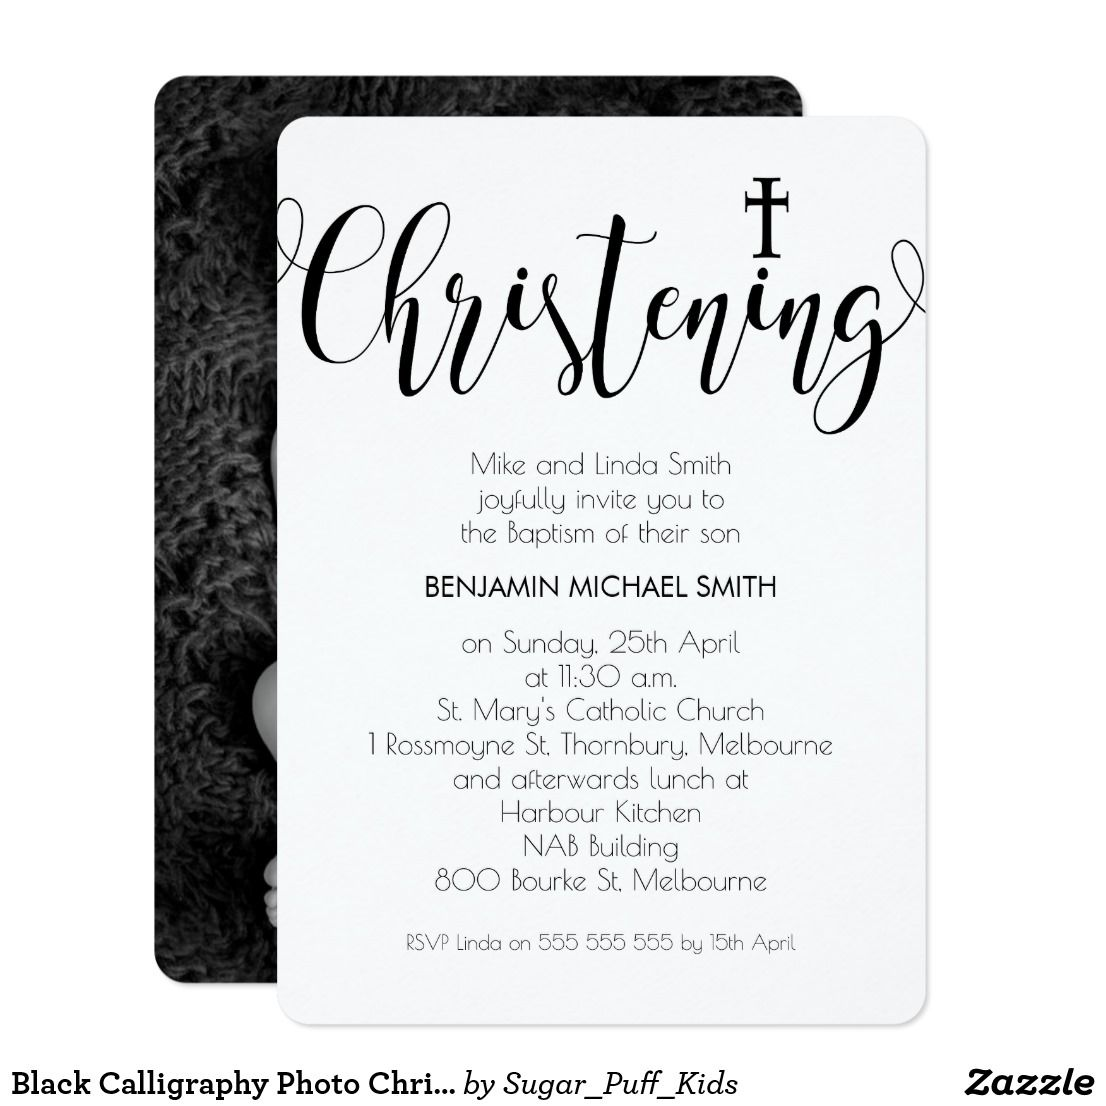 Black Calligraphy Photo Christening Invitation